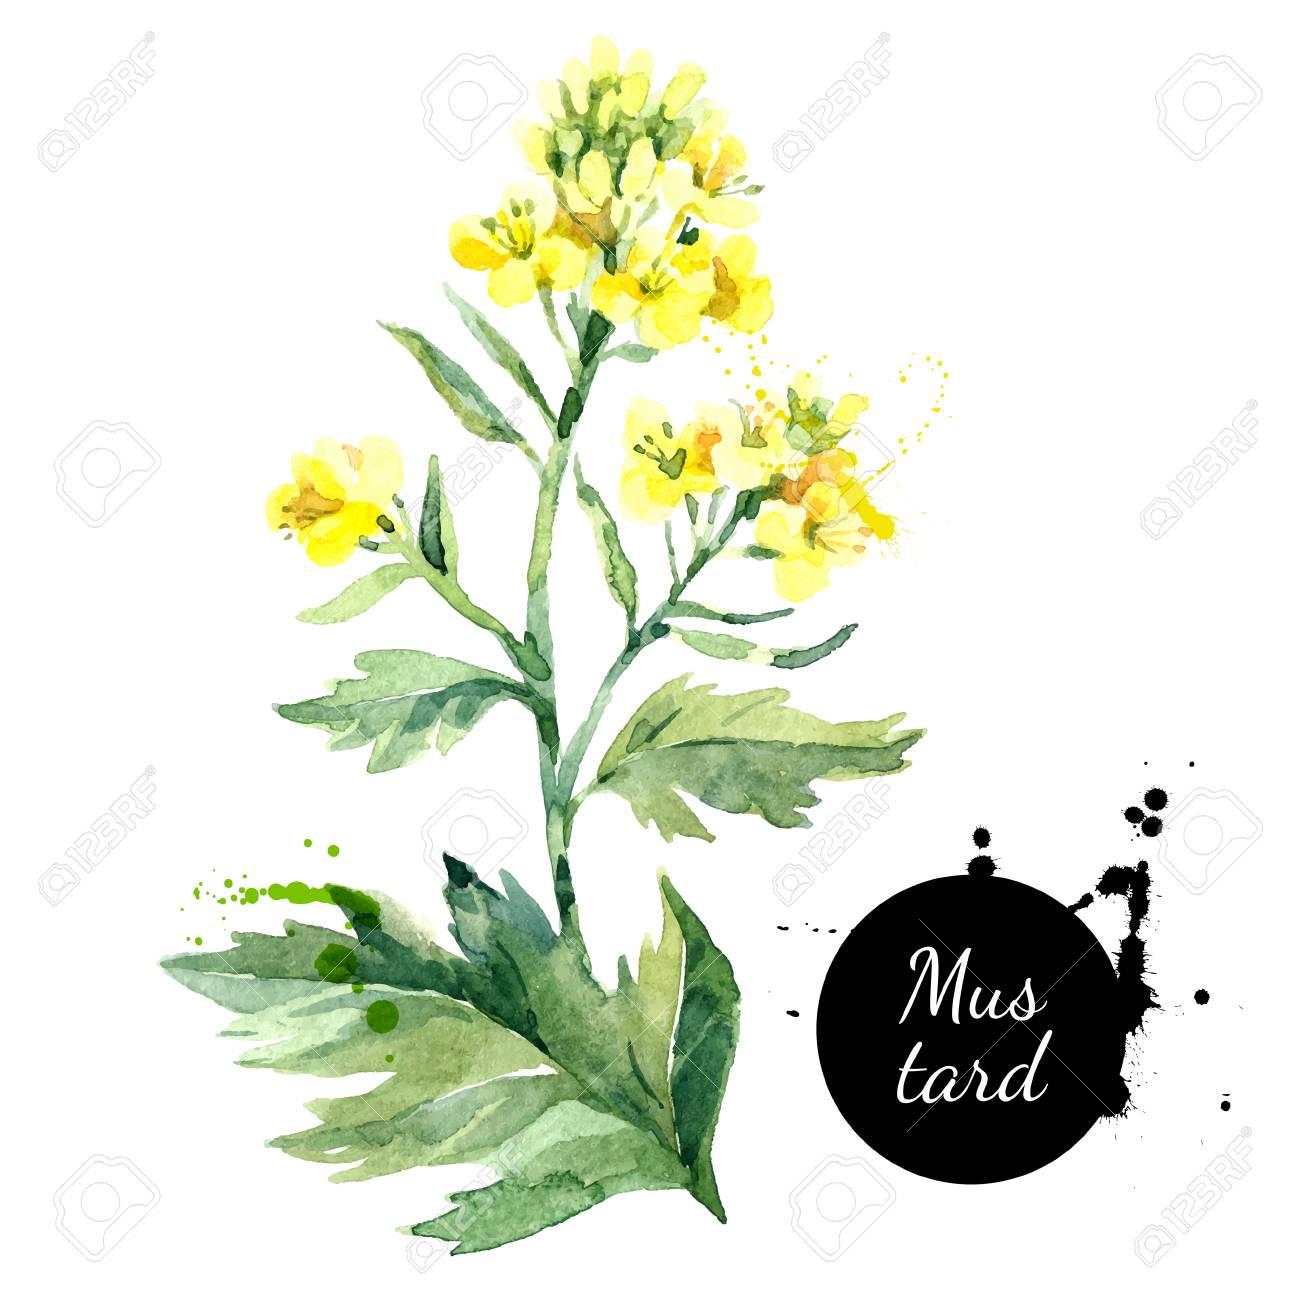 Mustard Flower Background Illustration Stock Illustration - Download Image  Now - iStock